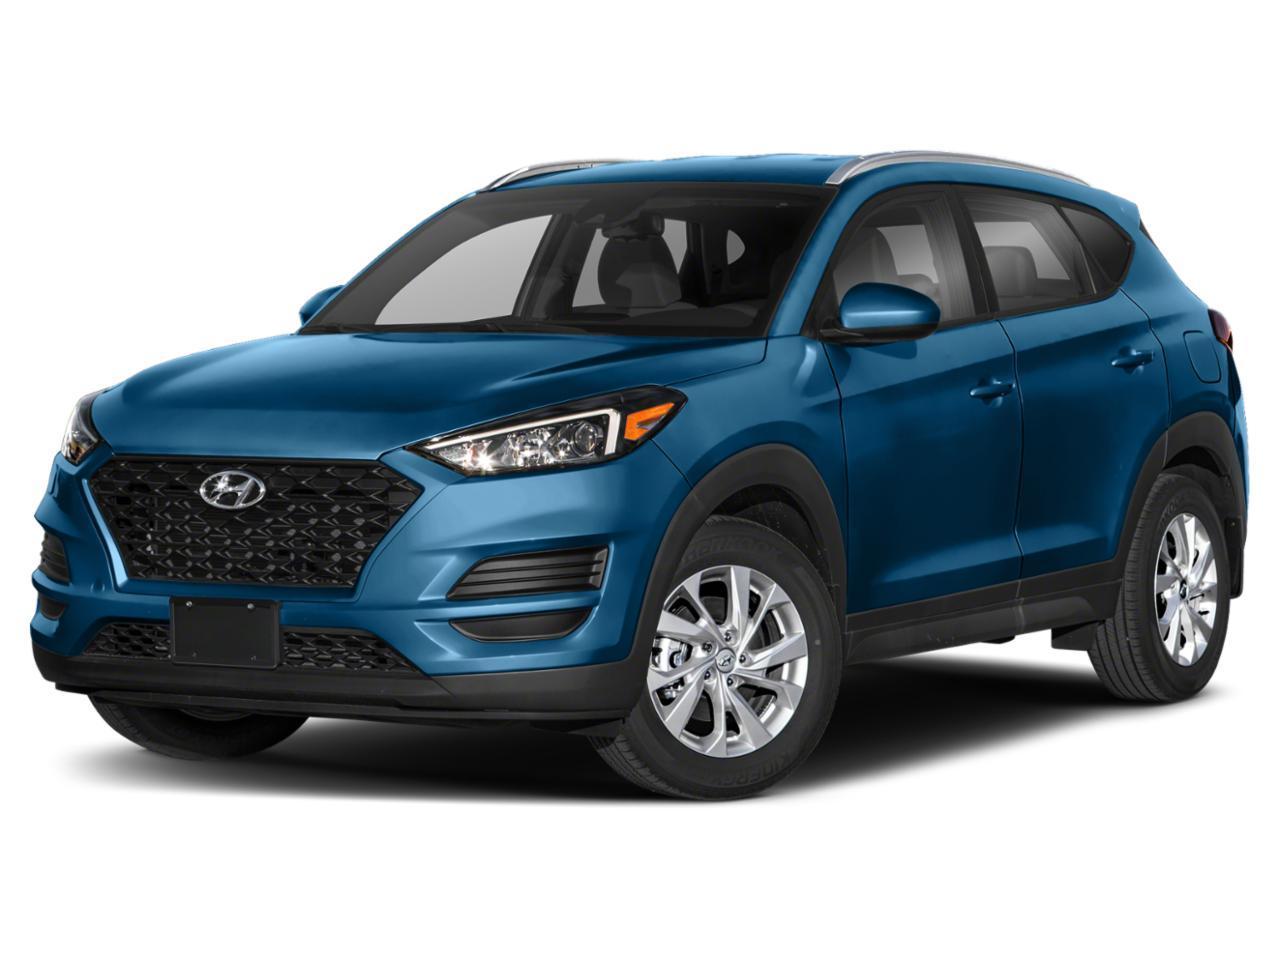 2019 Hyundai Tucson Vehicle Photo in Tucson, AZ 85712